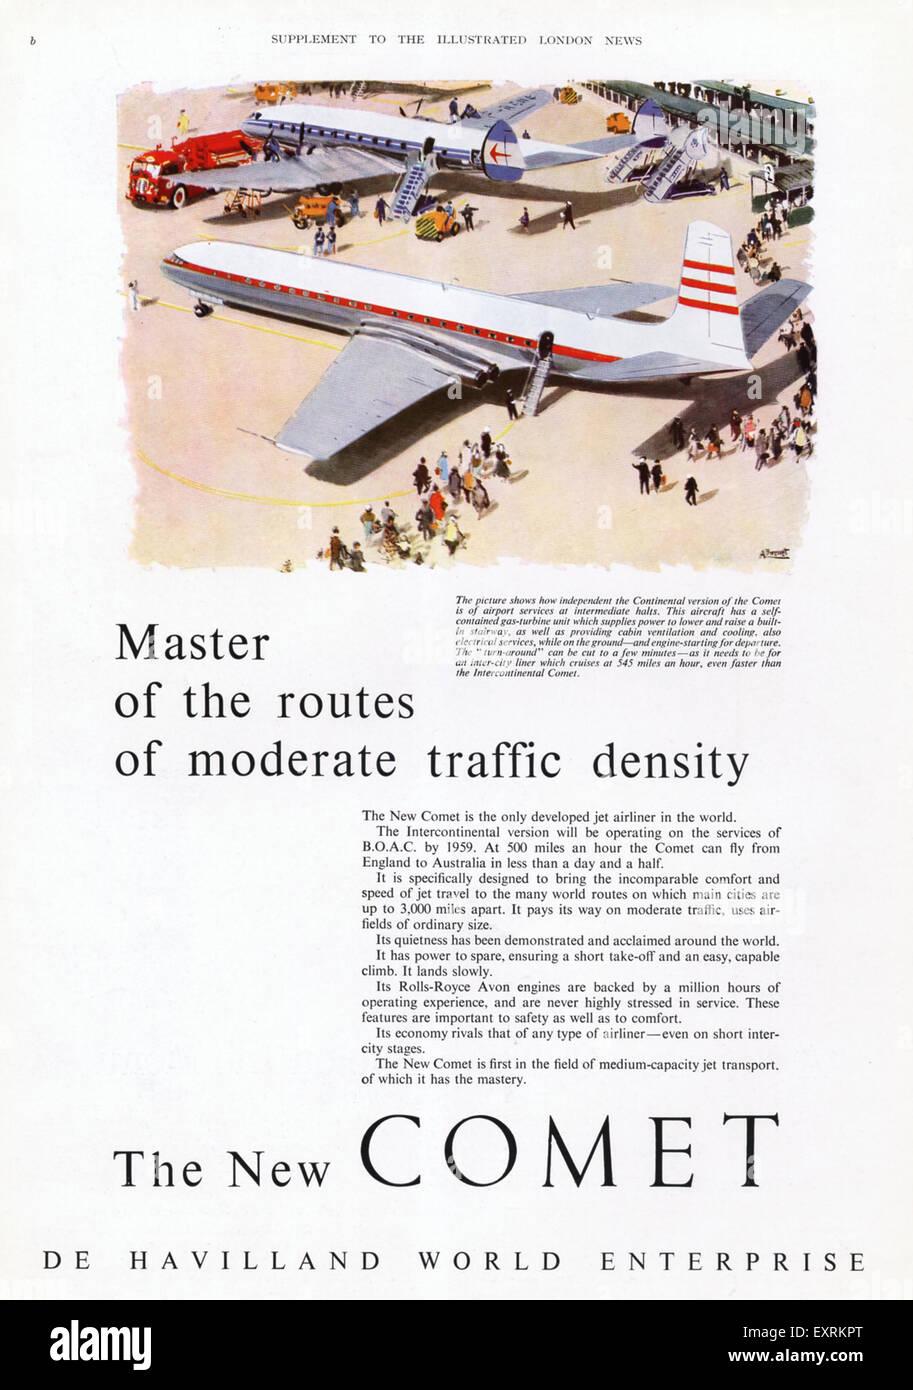 1950s UK De Havilland Magazine Advert - Stock Image